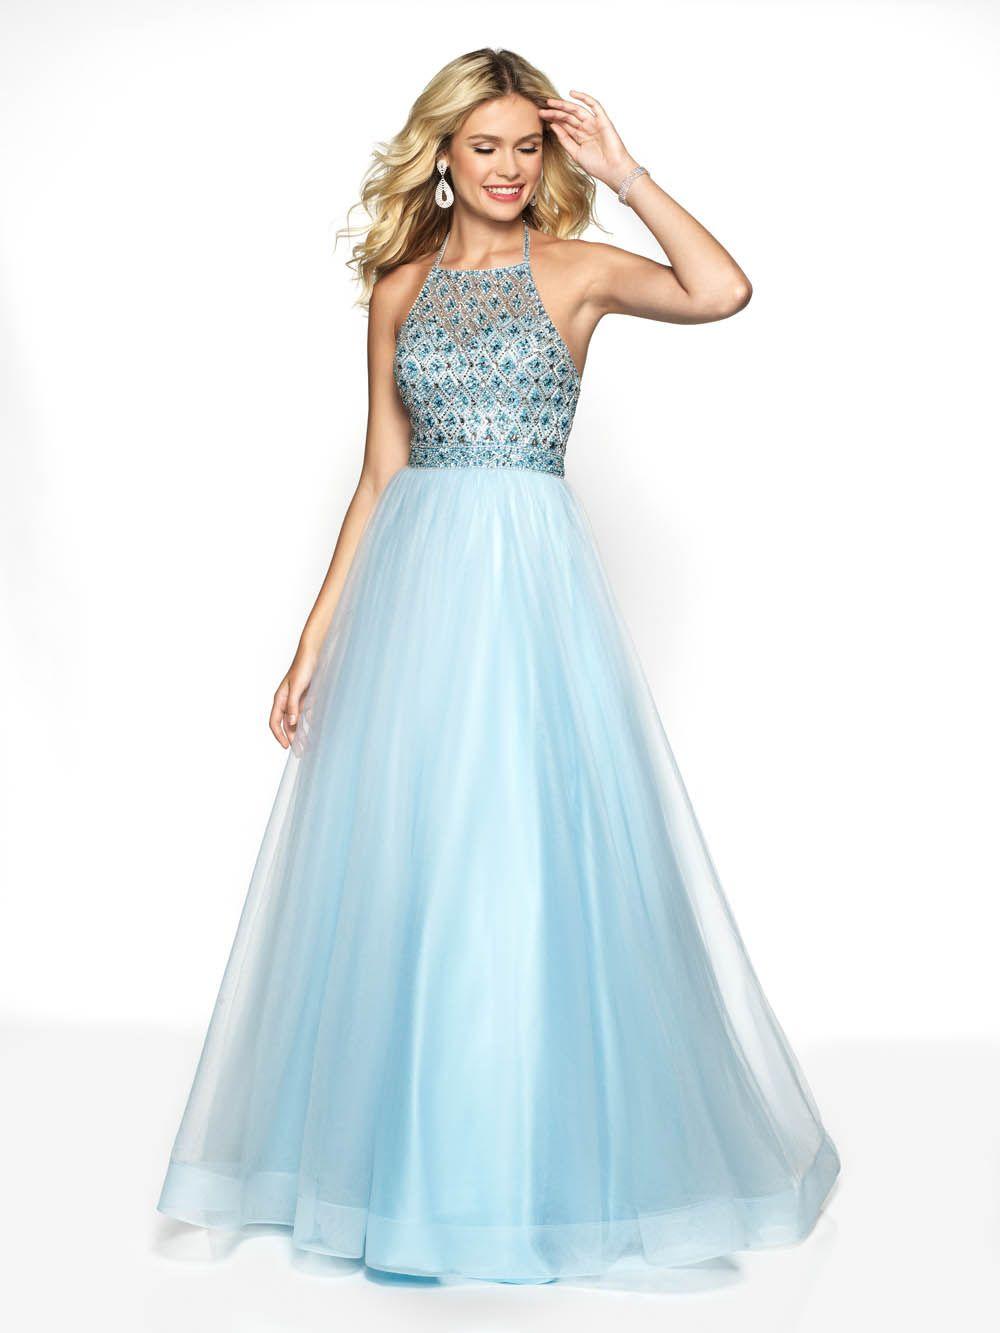 Blush Prom 5708 International Prom Association Blush Prom Dress Blush Prom Top Prom Dresses [ 1333 x 1000 Pixel ]